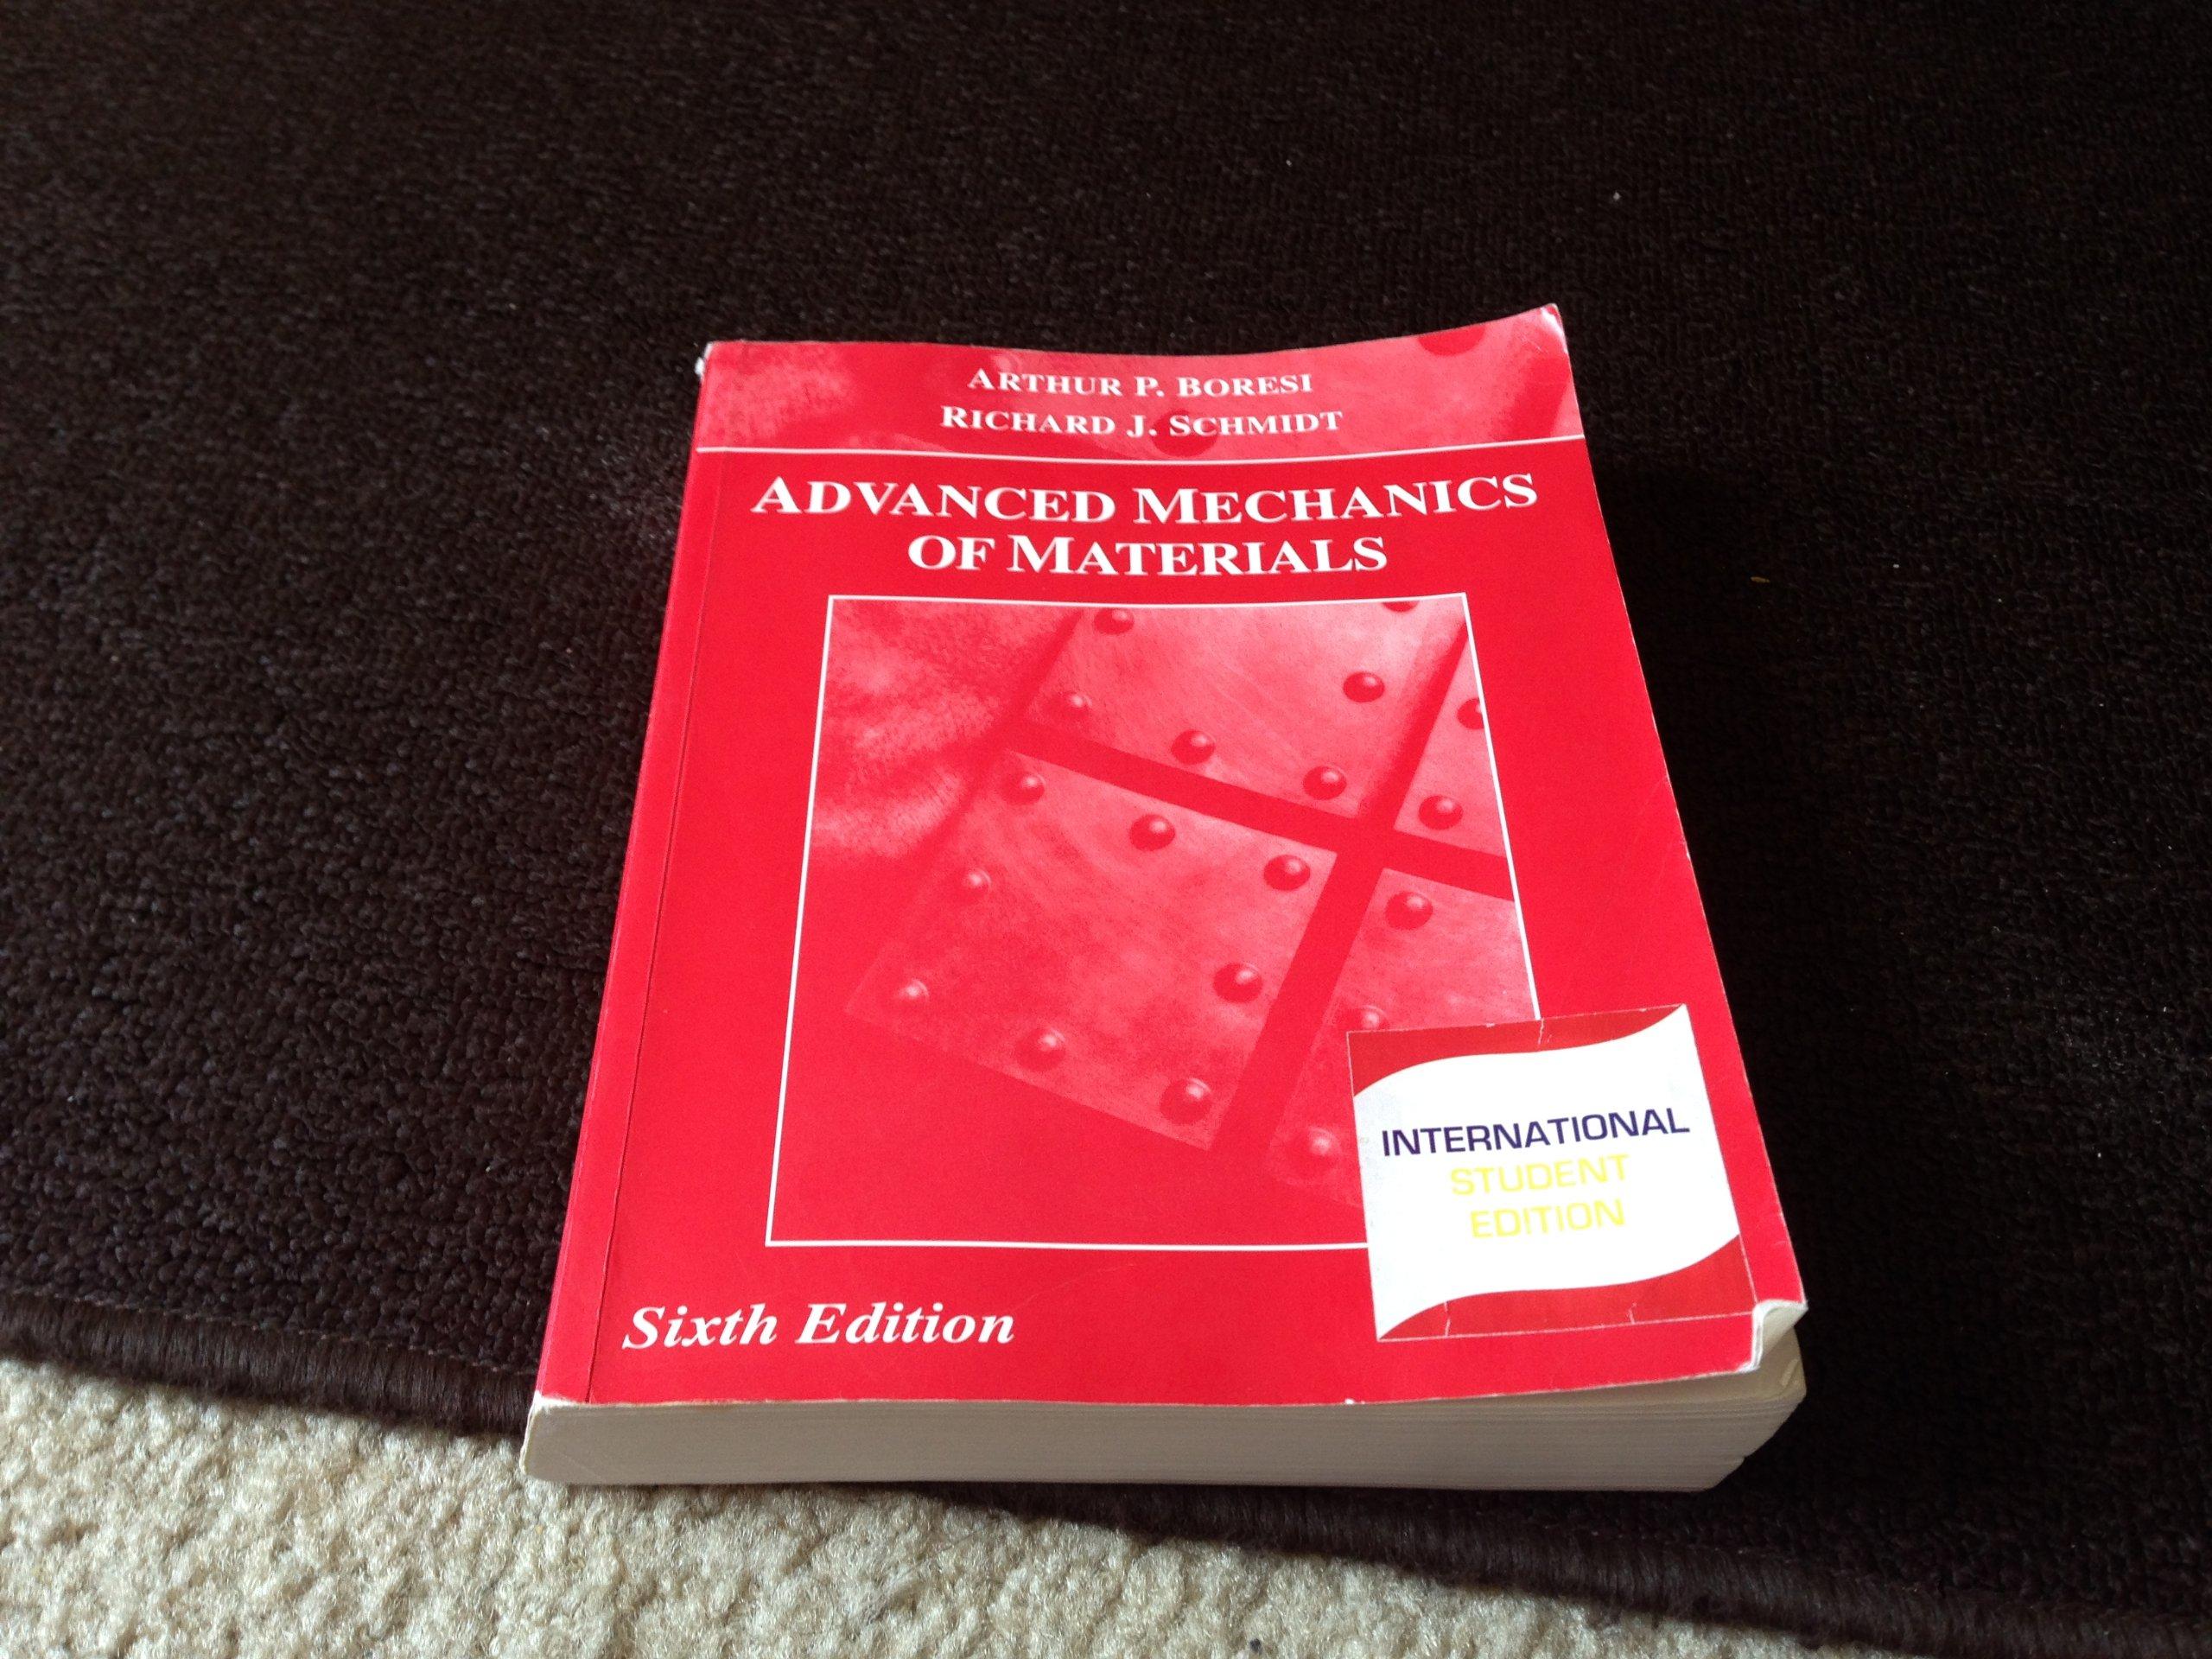 Advanced Mechanics of Materials: Arthur P Boresi: 9789752843561:  Amazon.com: Books